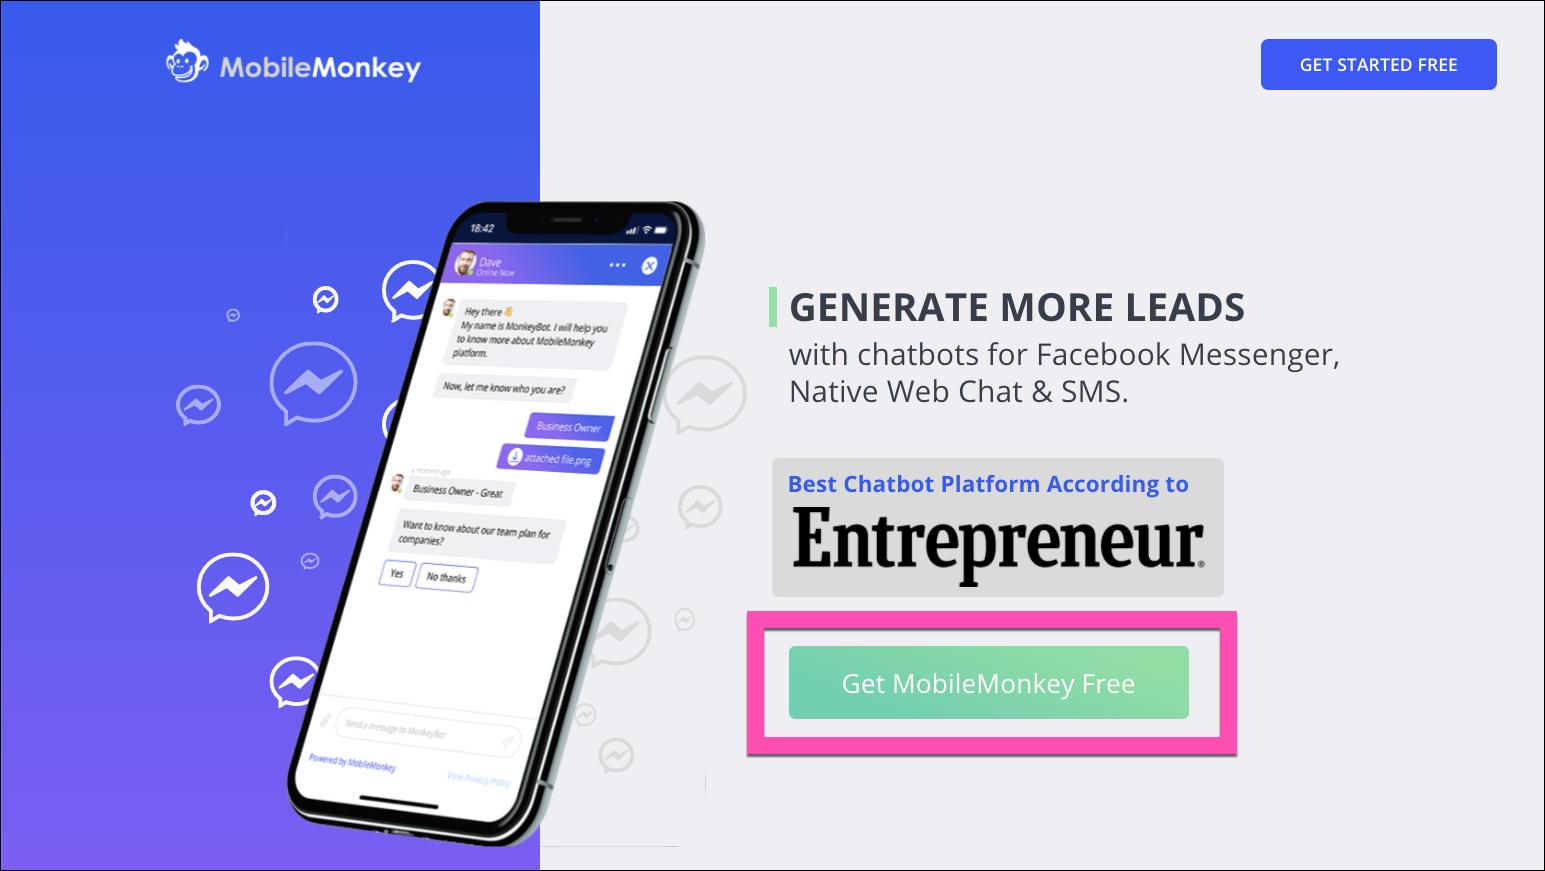 mobilemonkey free signup page